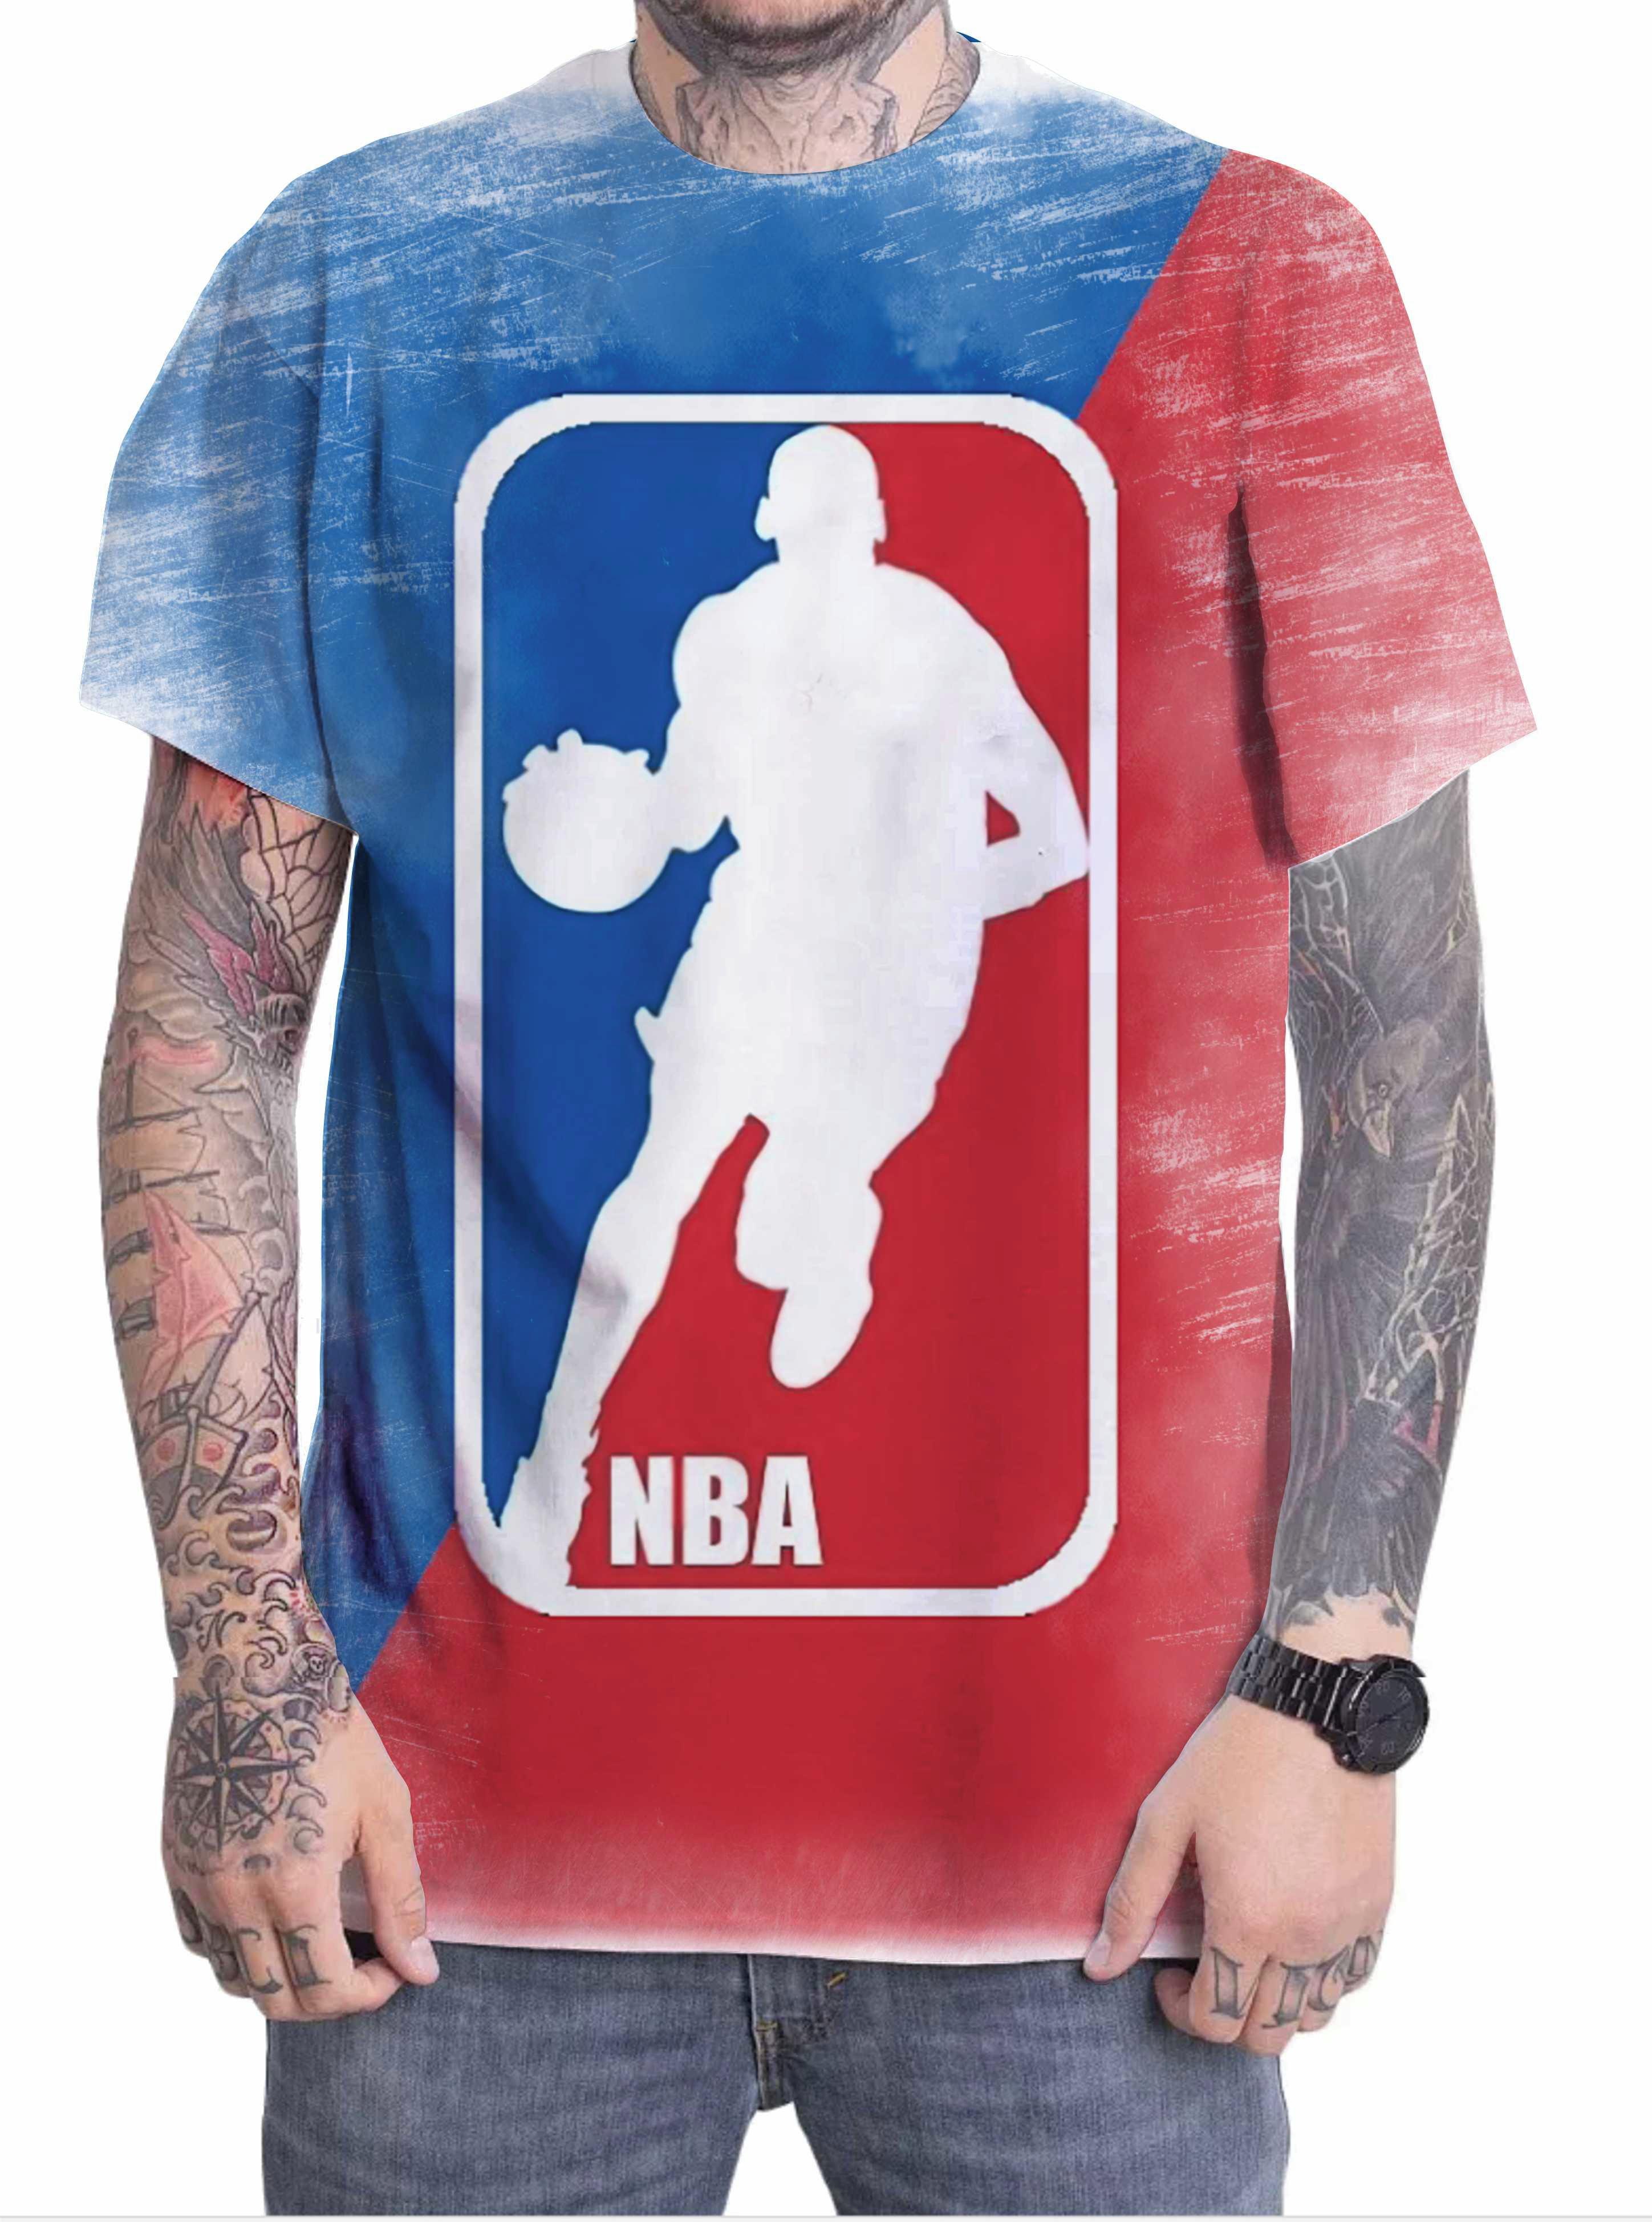 2848daaeb Camiseta Chicago Bulls Nba A3